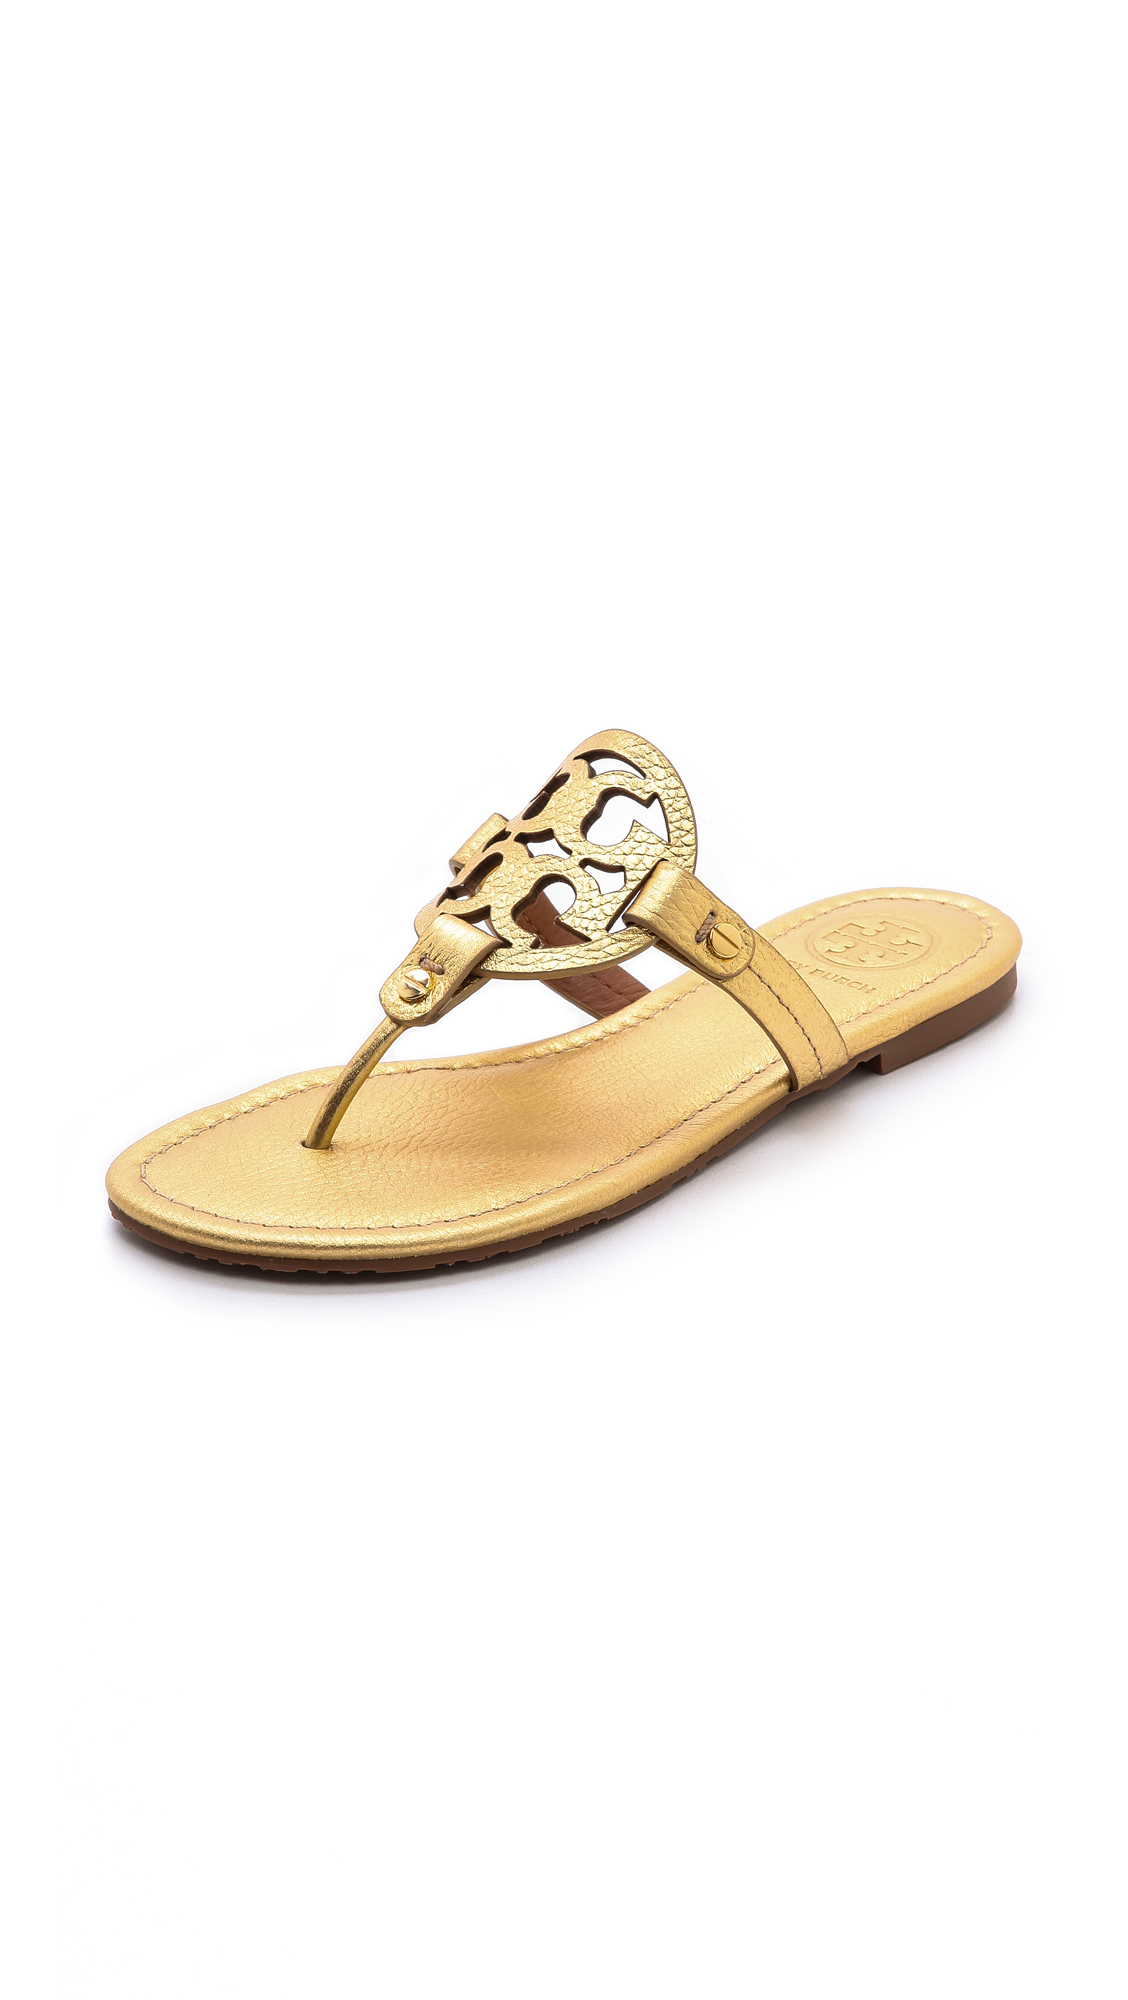 Tory Burch Flat Shoes Sale